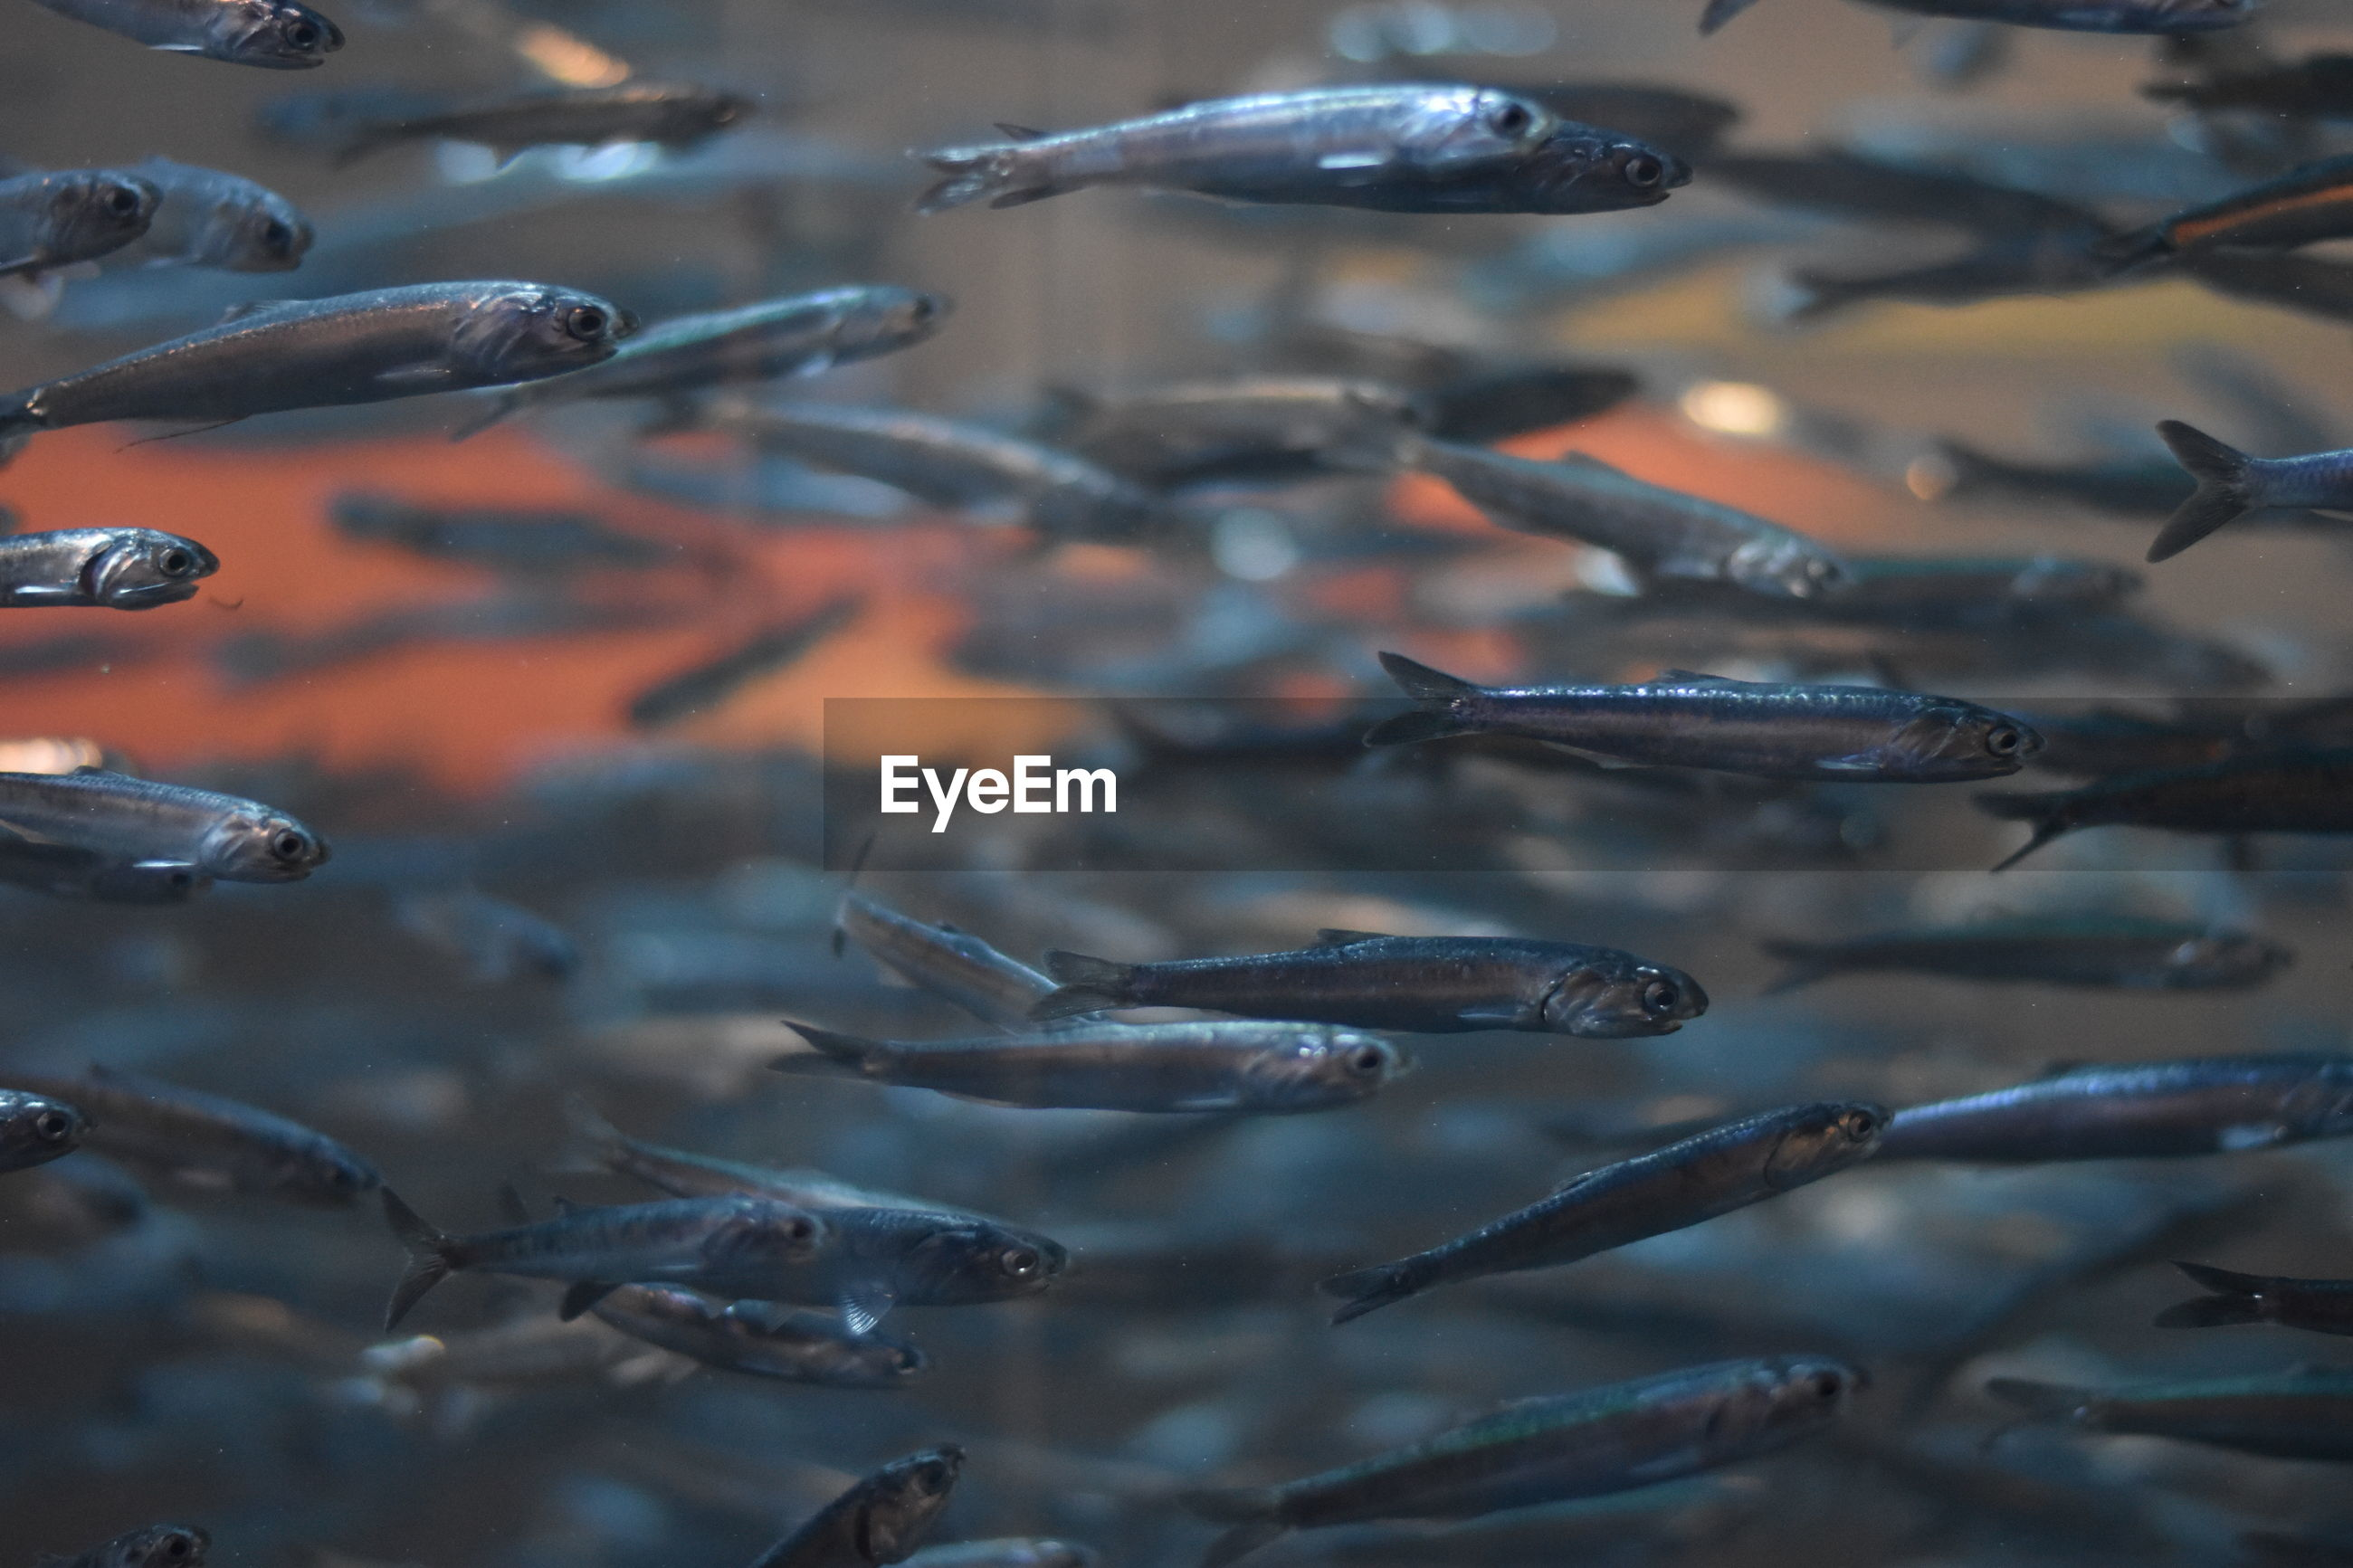 School of fish swimming in tank at aquarium